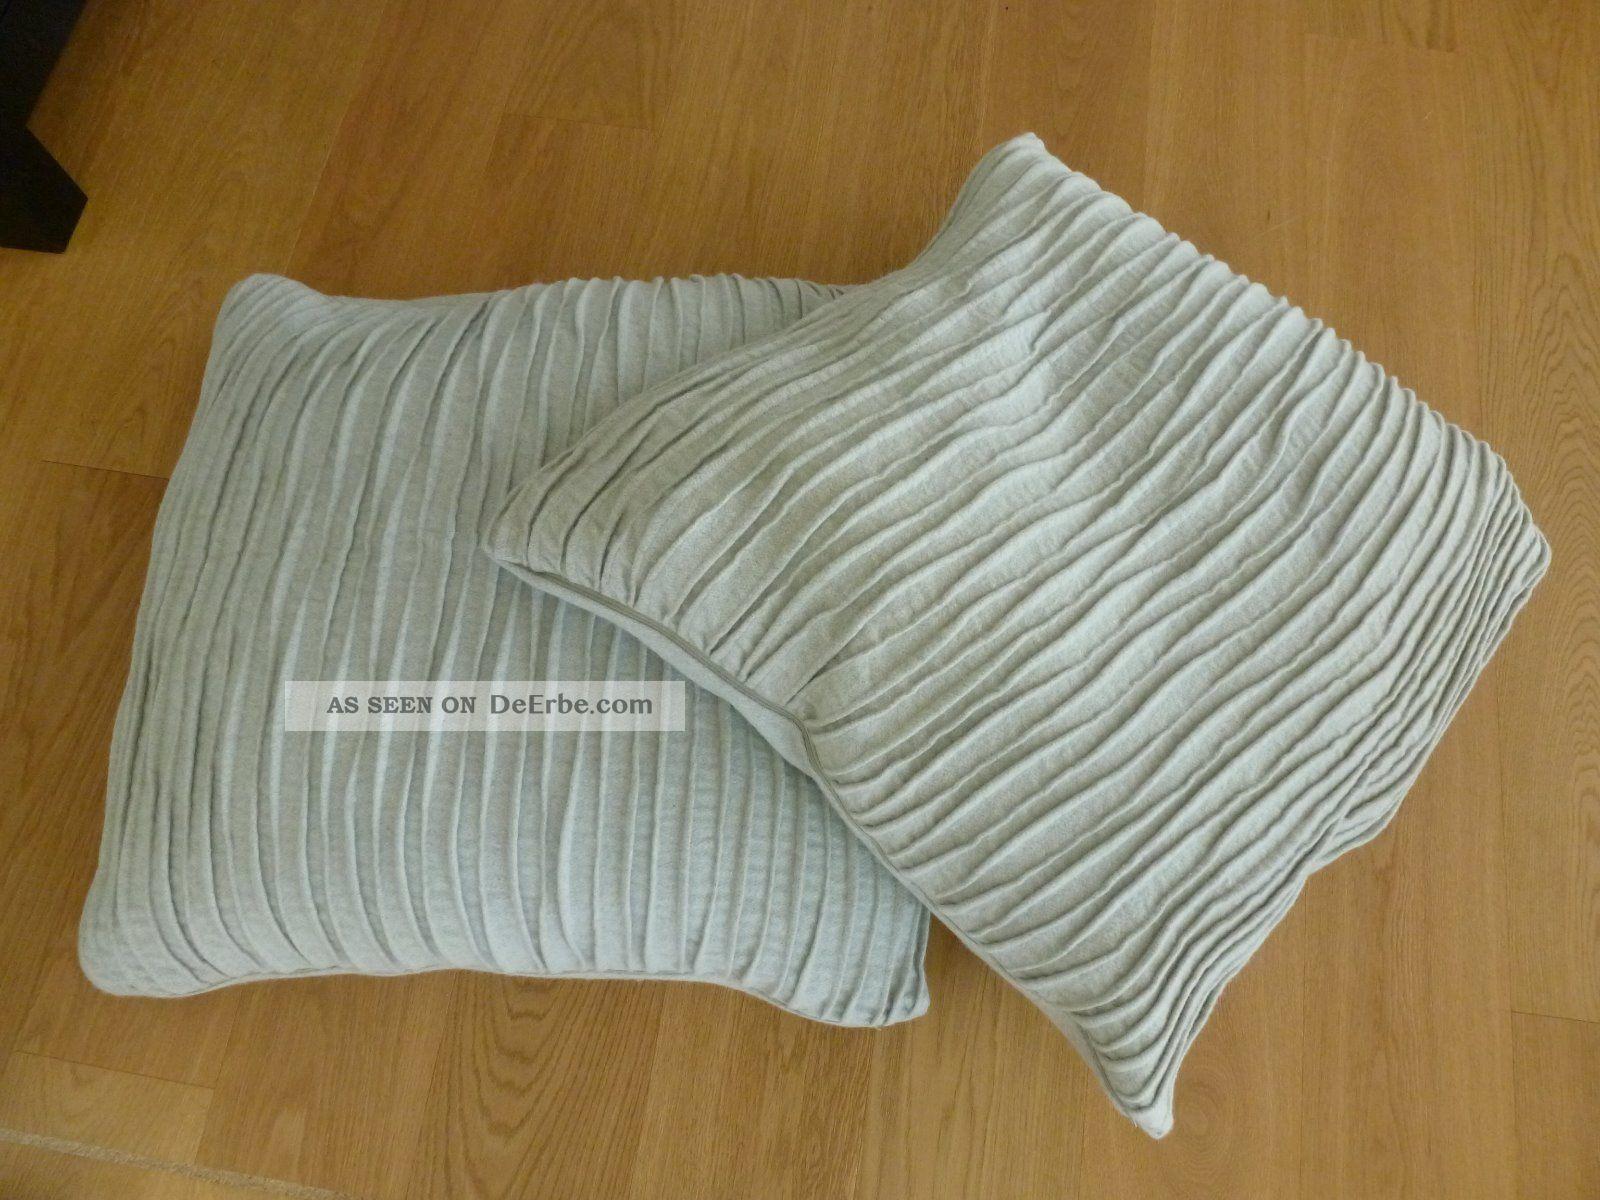 lounge kissen sofakissen h lle xxl 75x75 casa vivante modell welle filz. Black Bedroom Furniture Sets. Home Design Ideas